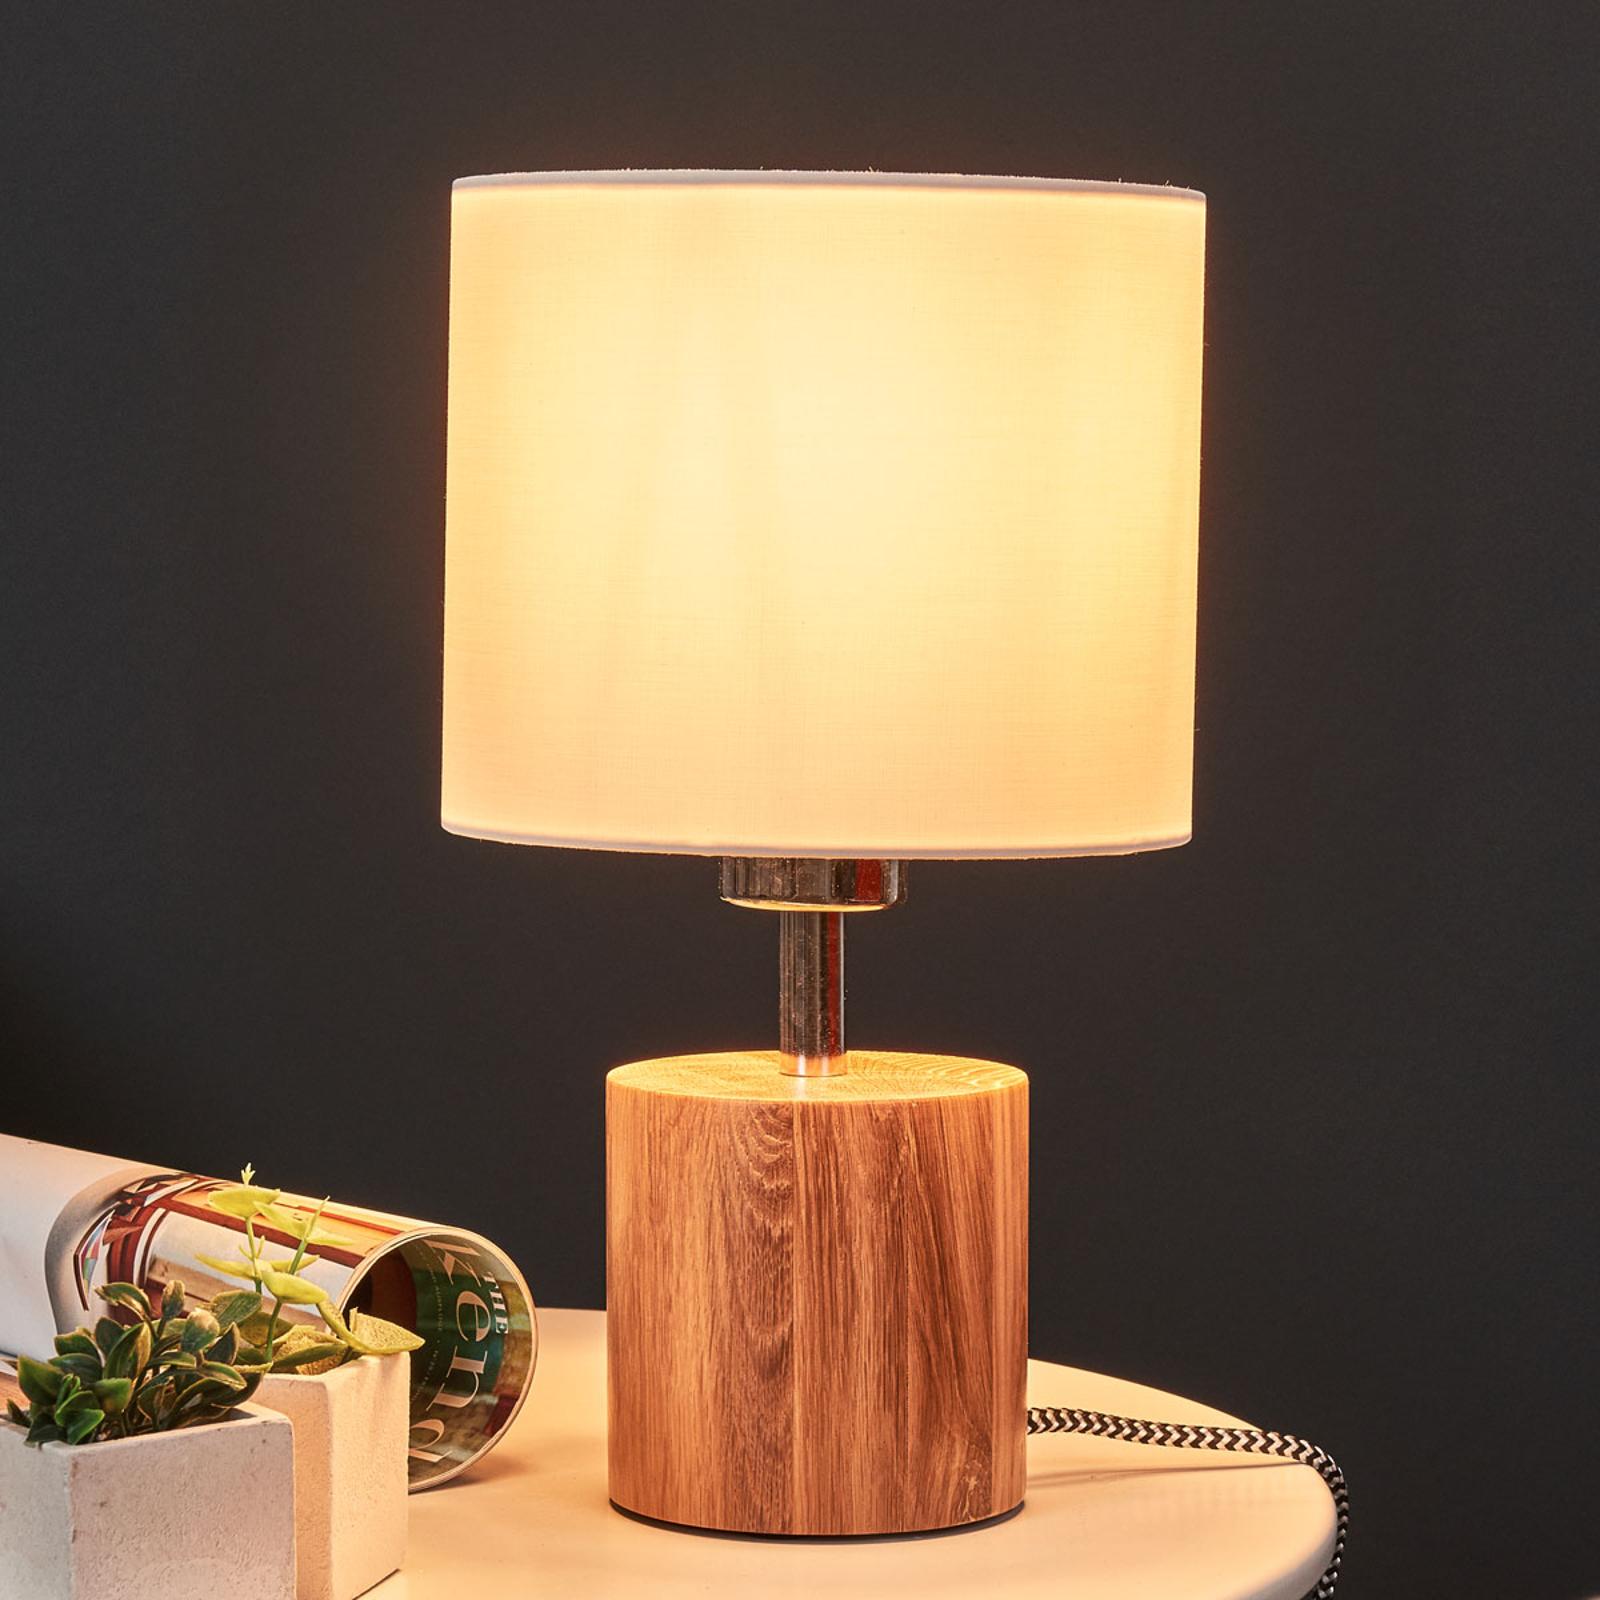 Tafellamp Trongo, cilinder geolied, lampenkap